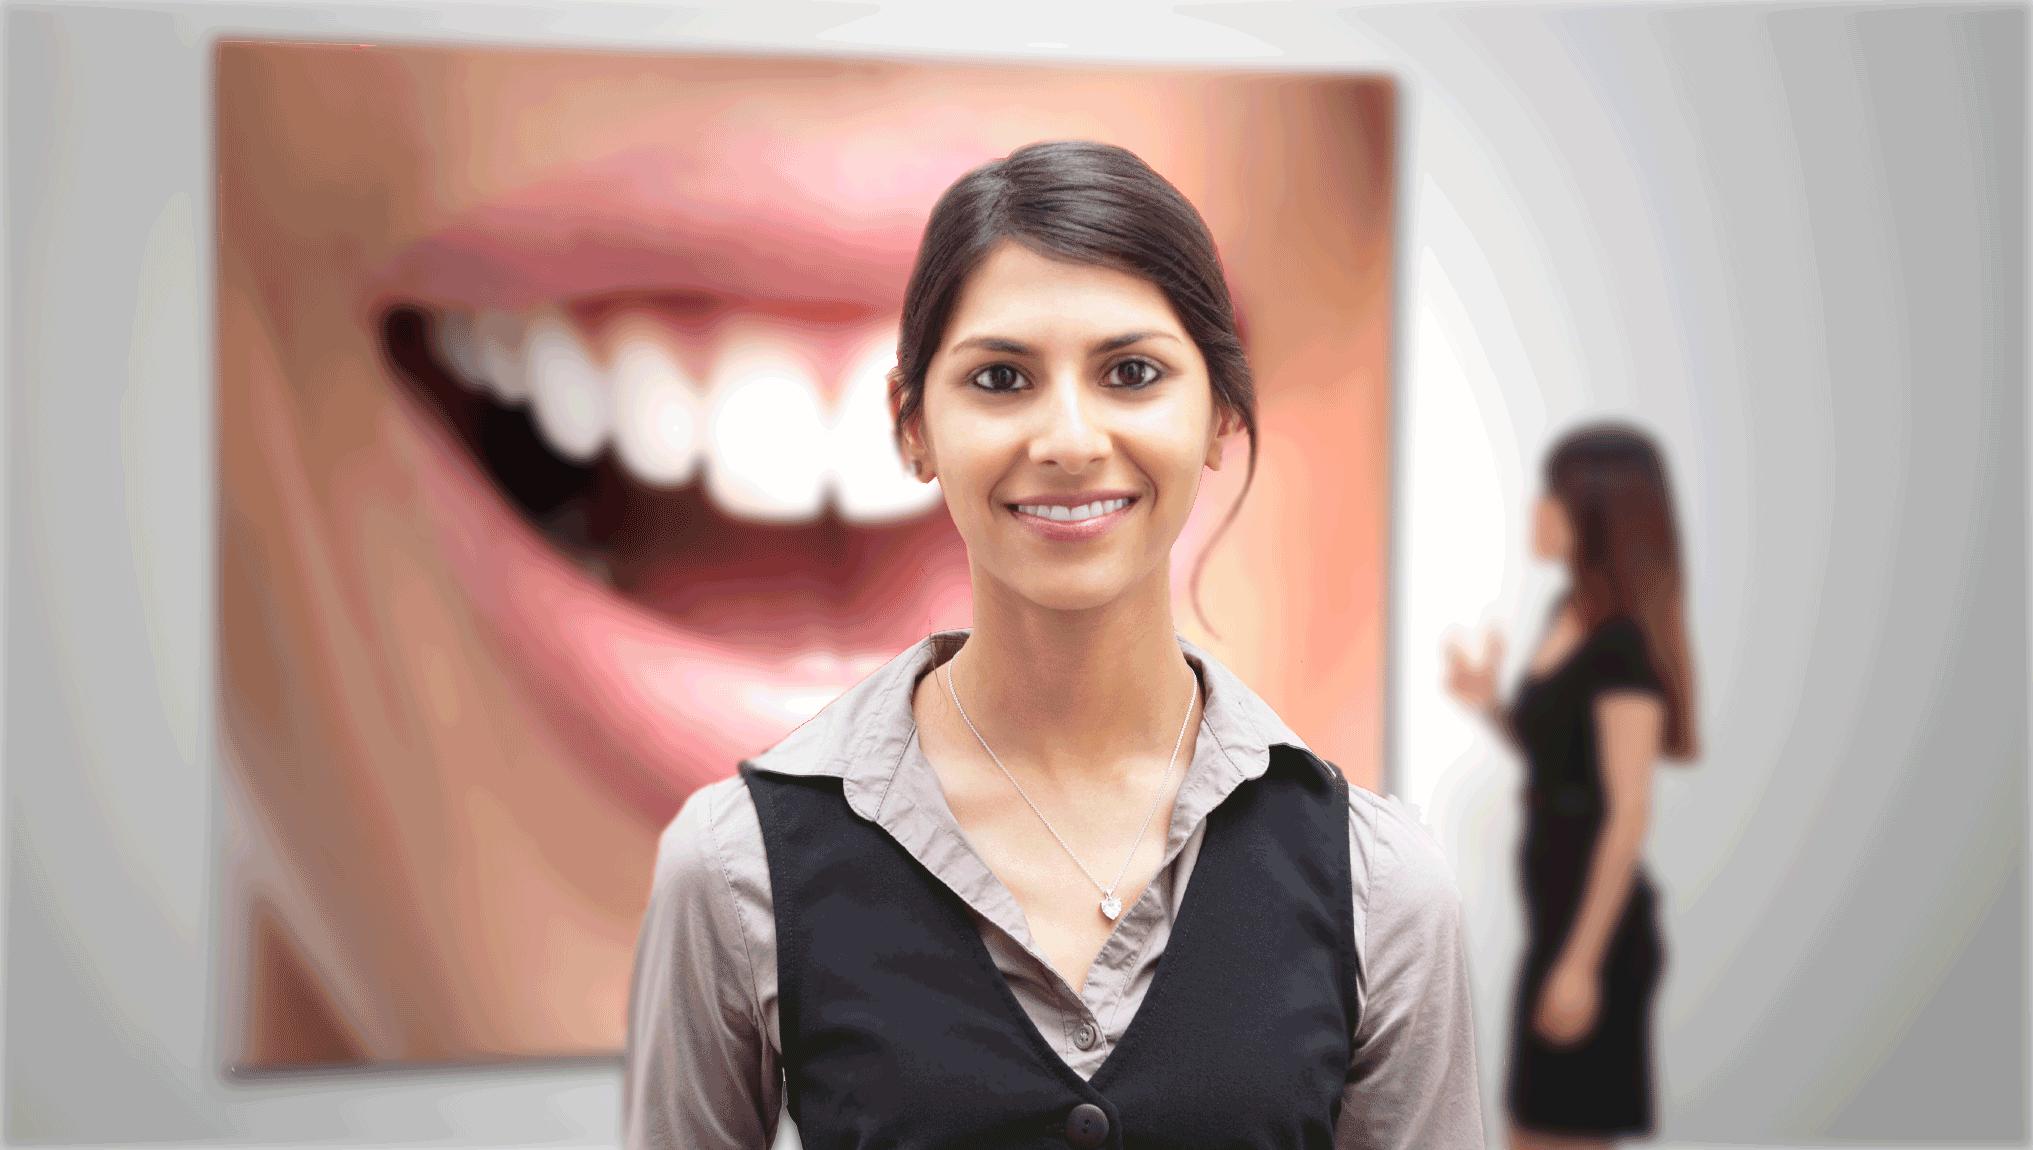 Smile Makeover Gallery Alexandria VA